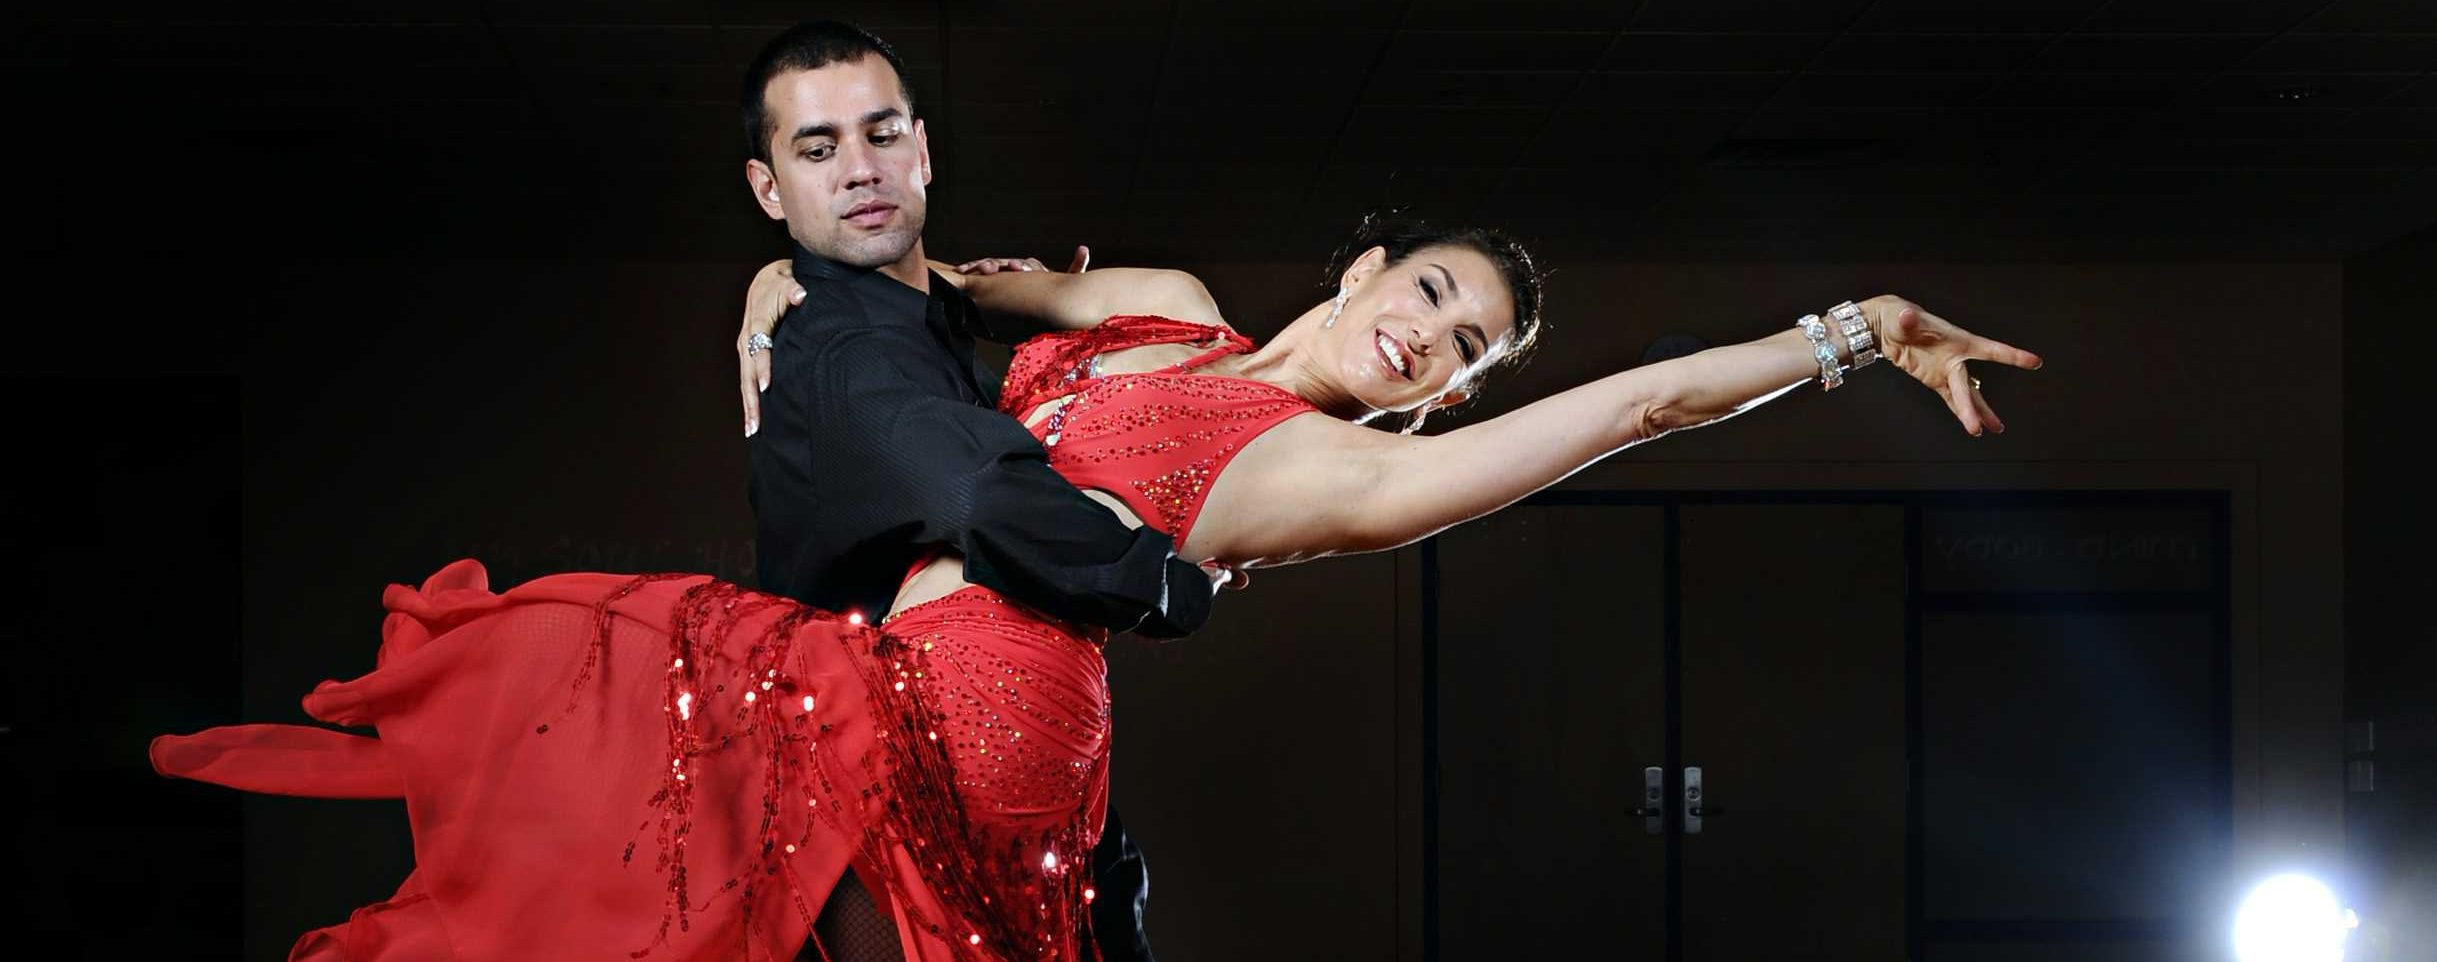 8 Health Health Benefits of Dance